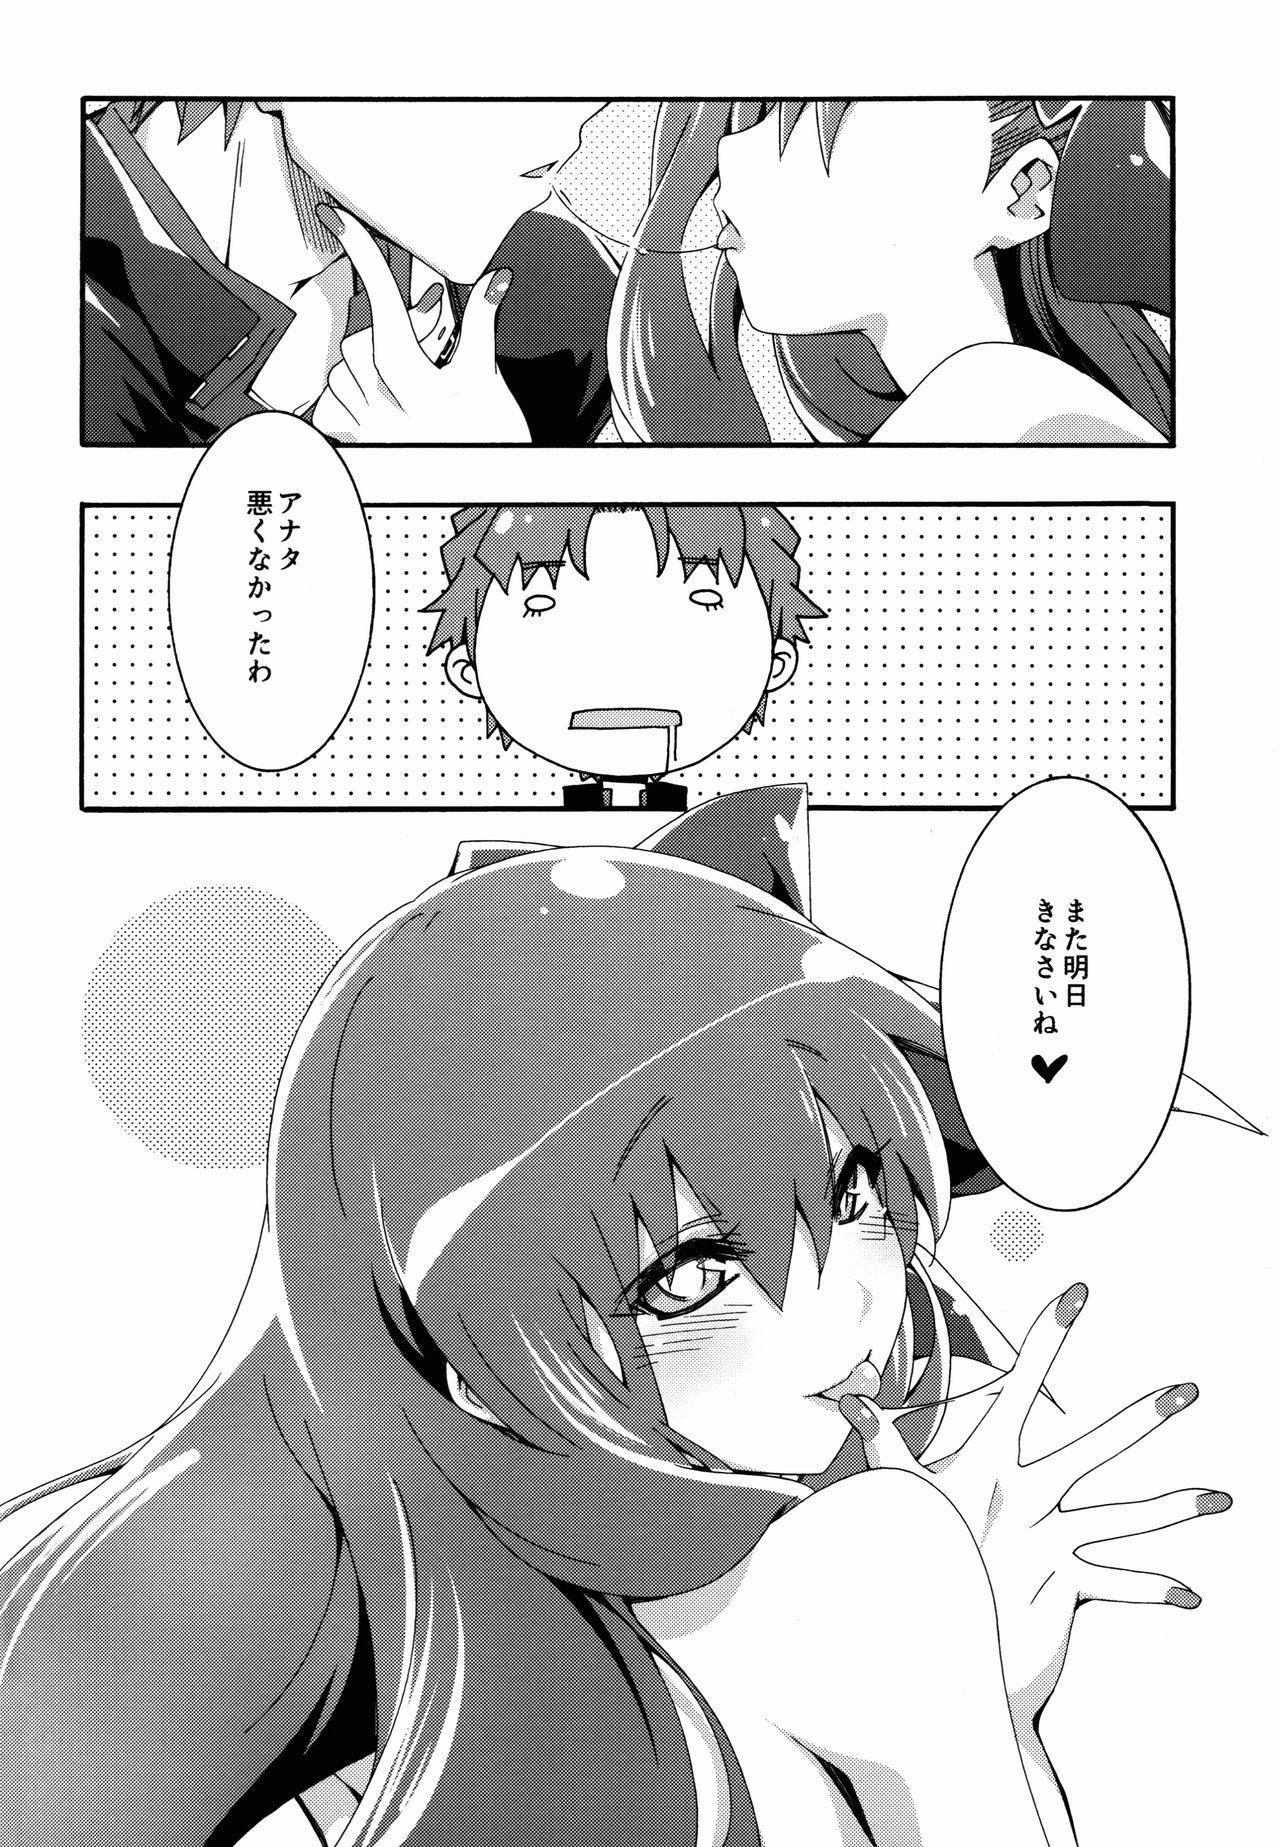 Melty/kiss 23